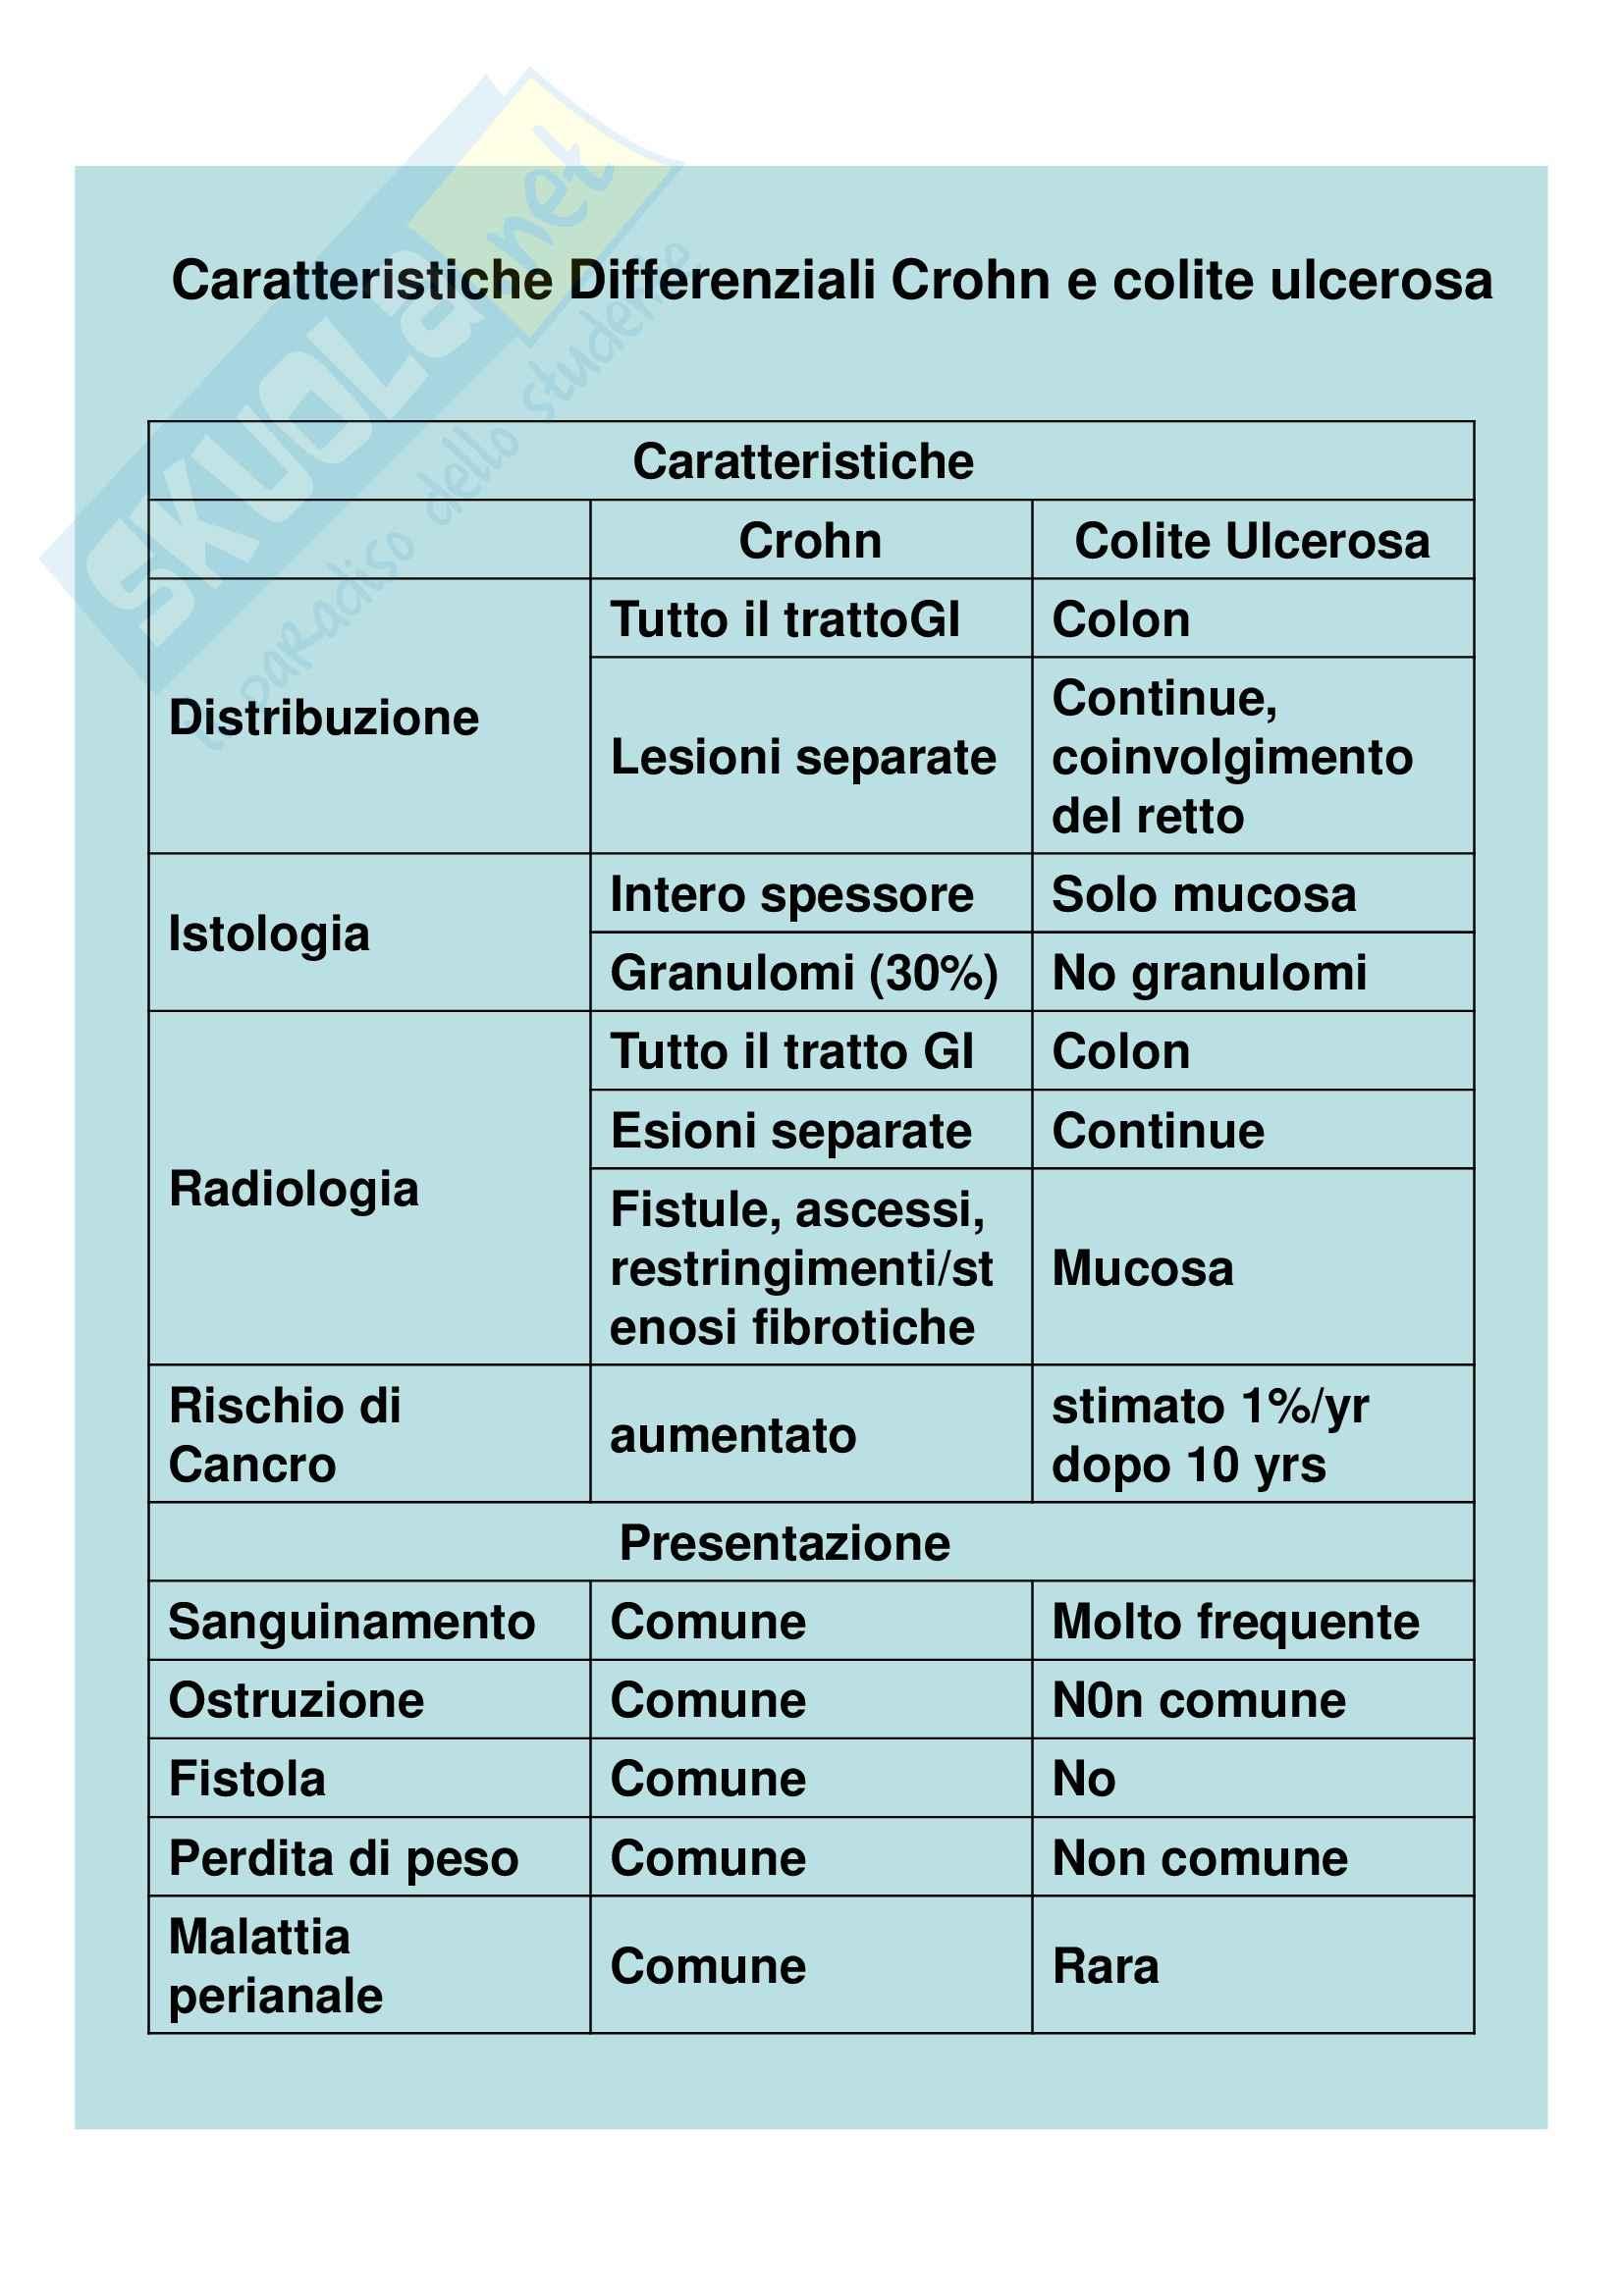 Medicina interna - diarrea cronica Pag. 16